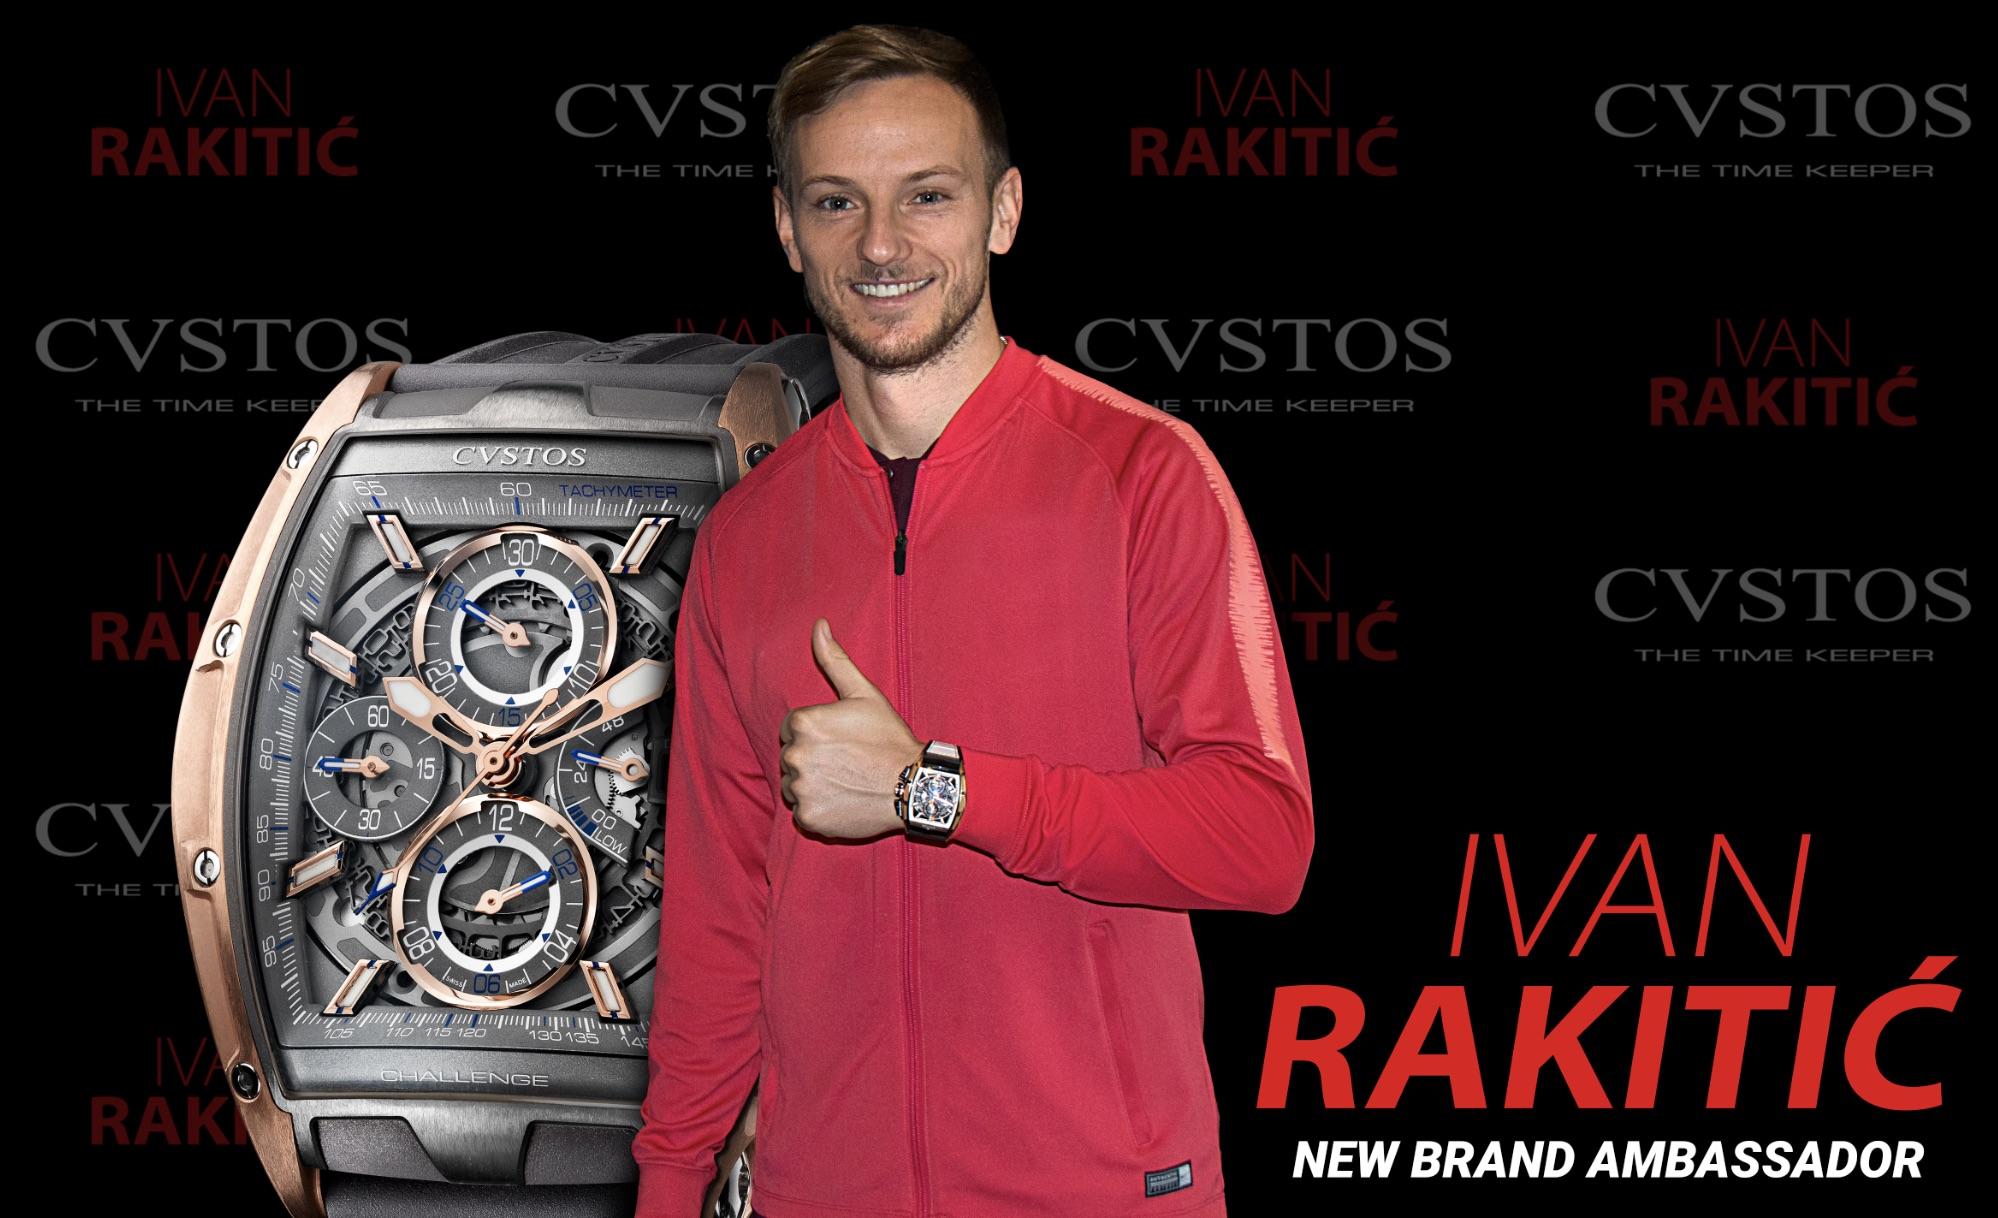 CVSTOS x Ivan Rakitic